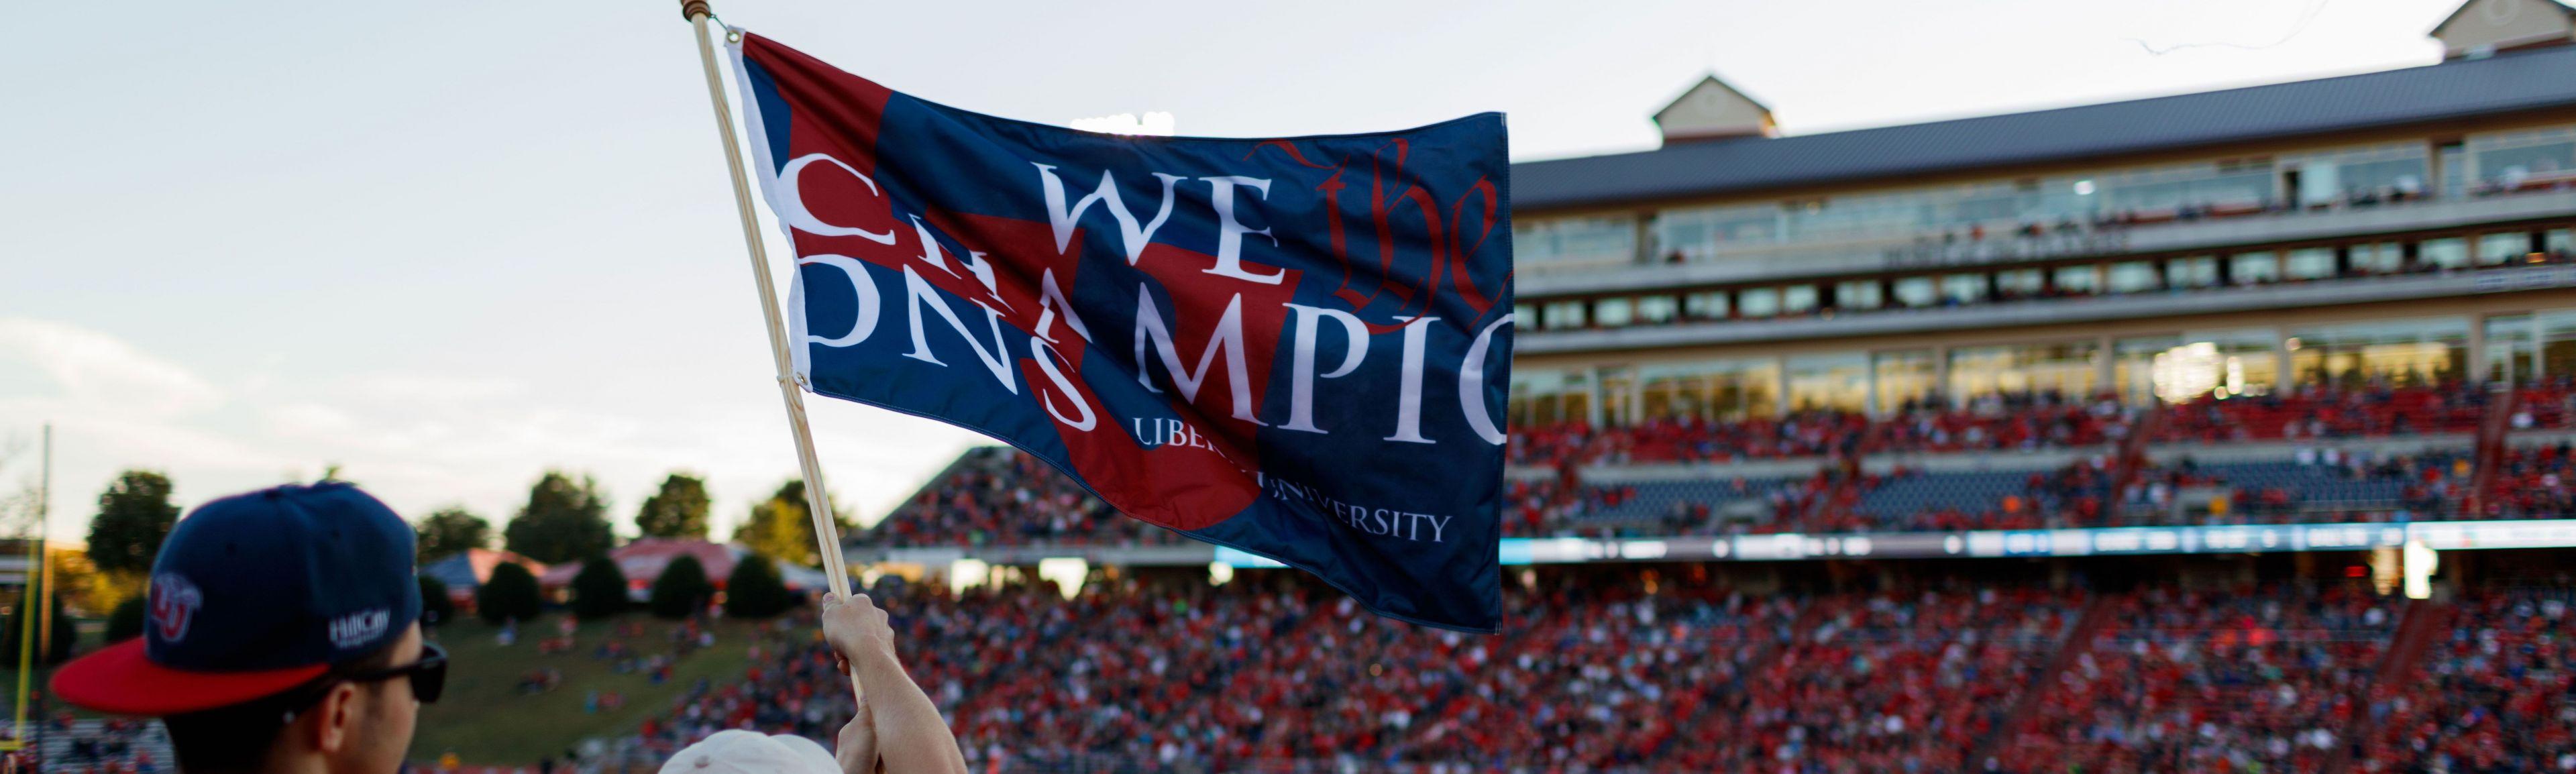 Top Ten Reasons To Choose Liberty University